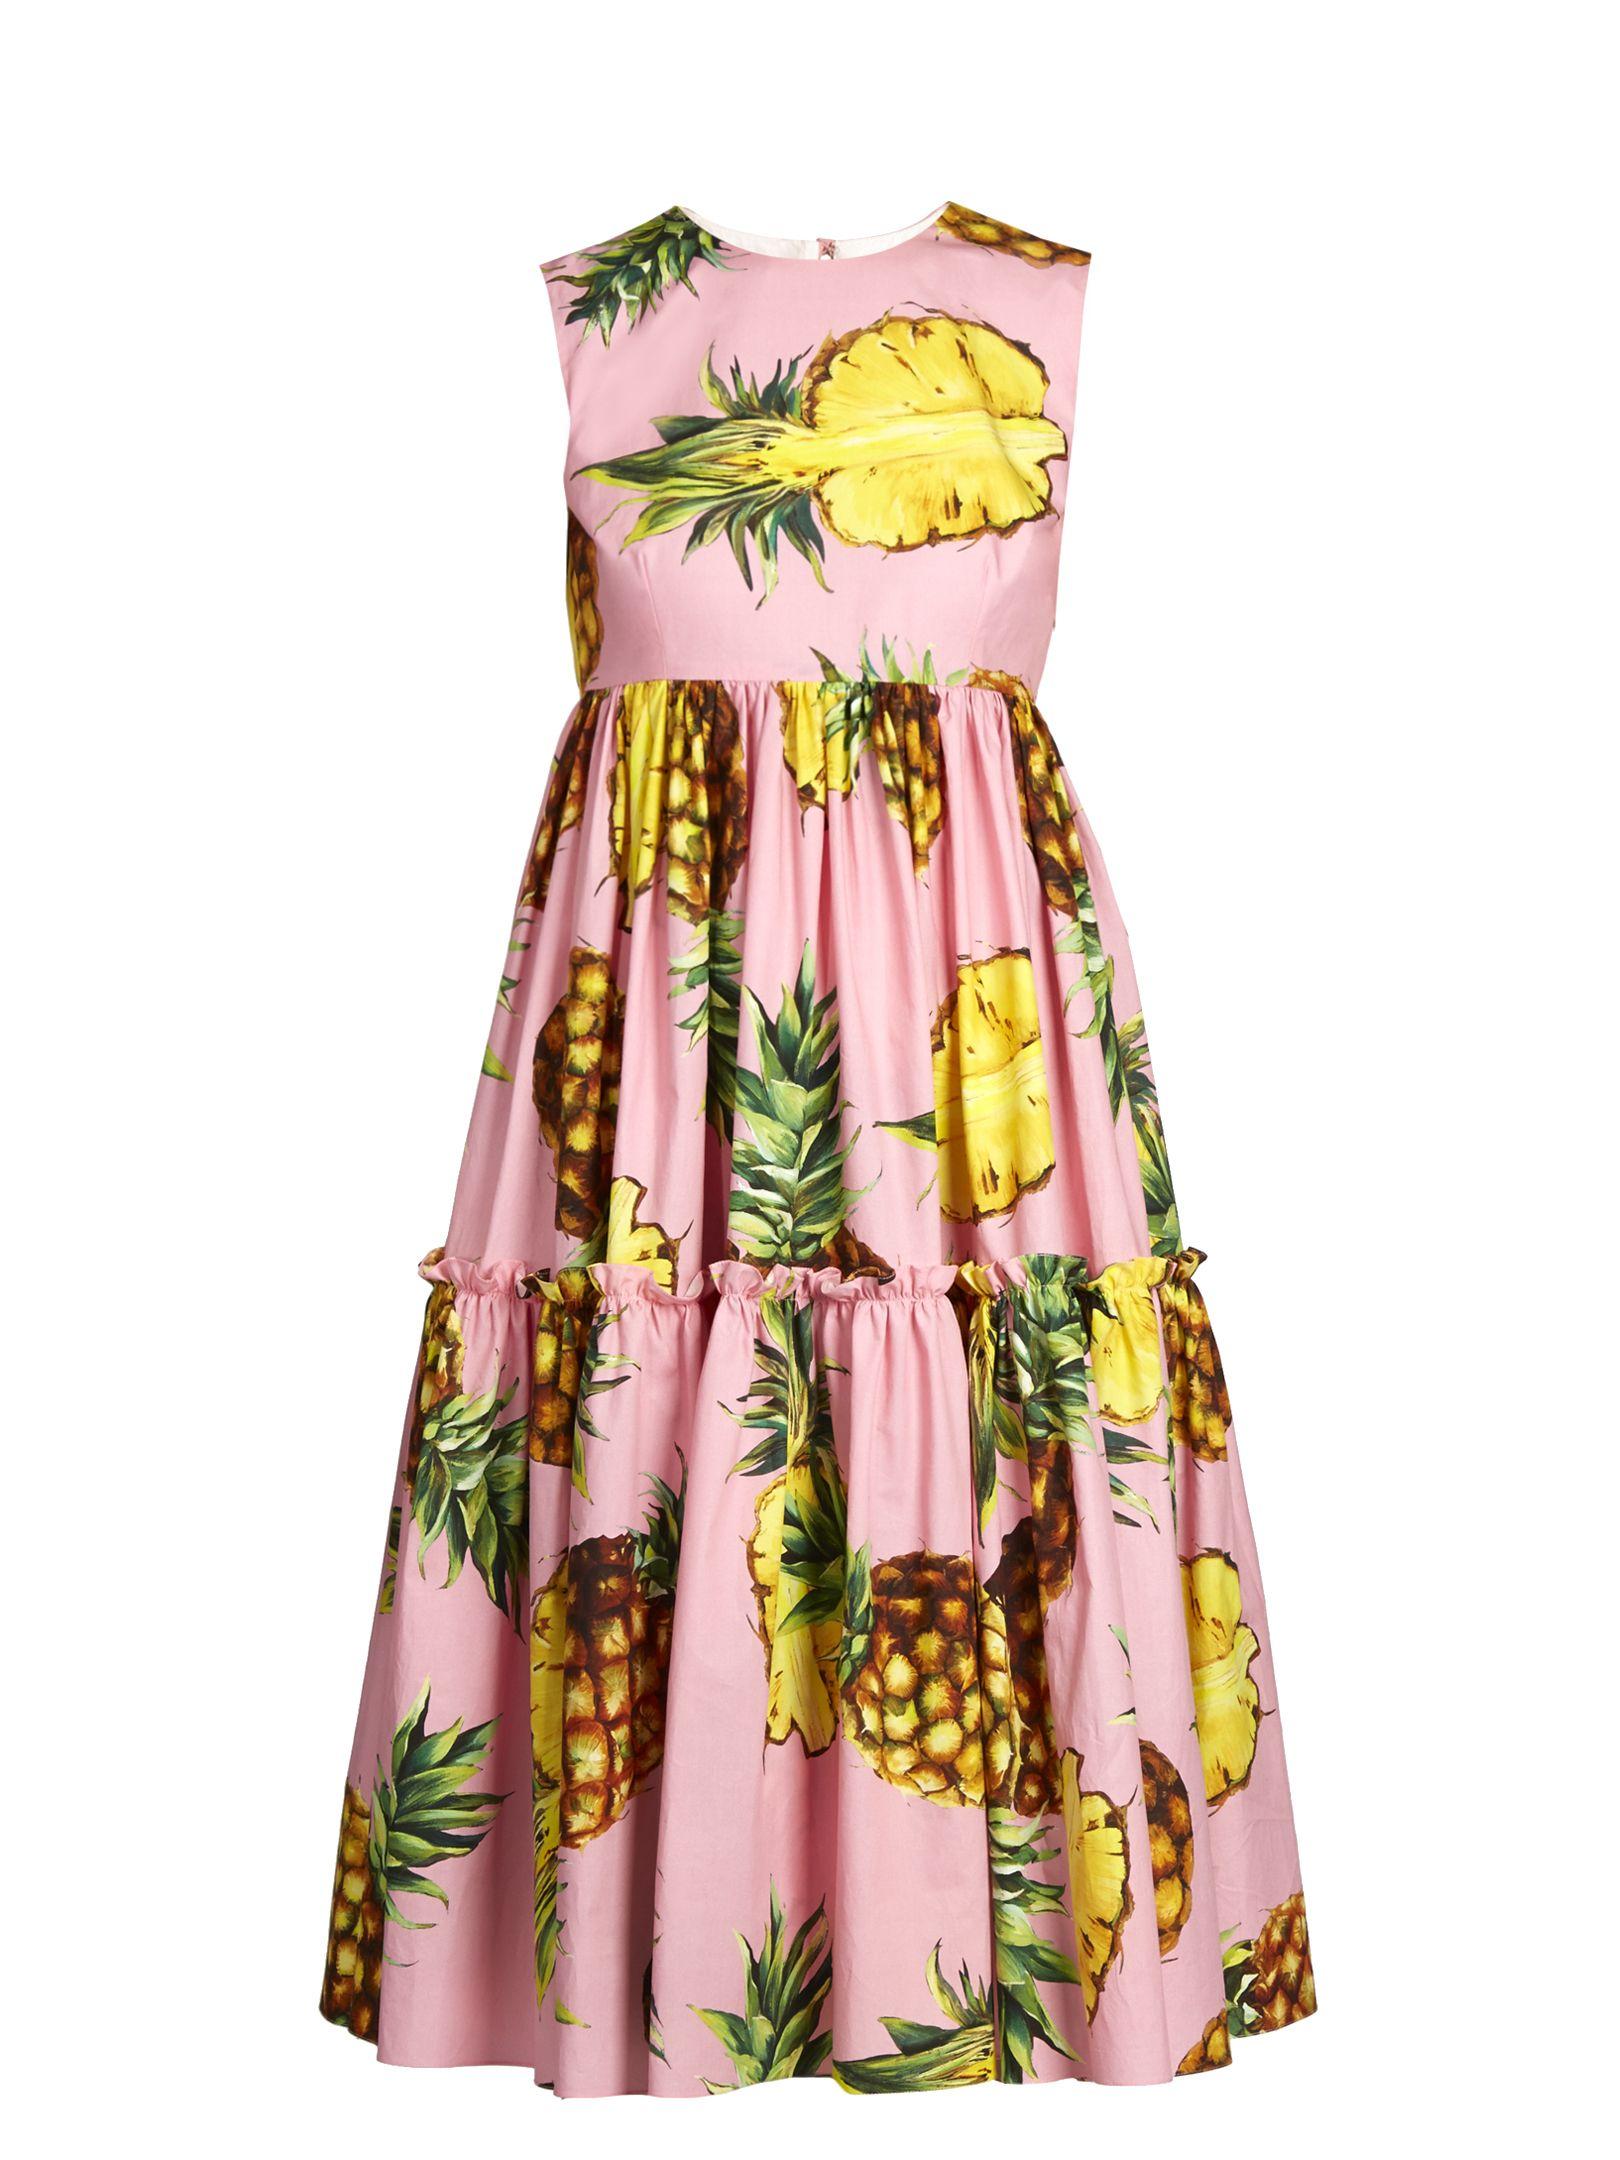 270e3b661335 Pineapple-print cotton dress